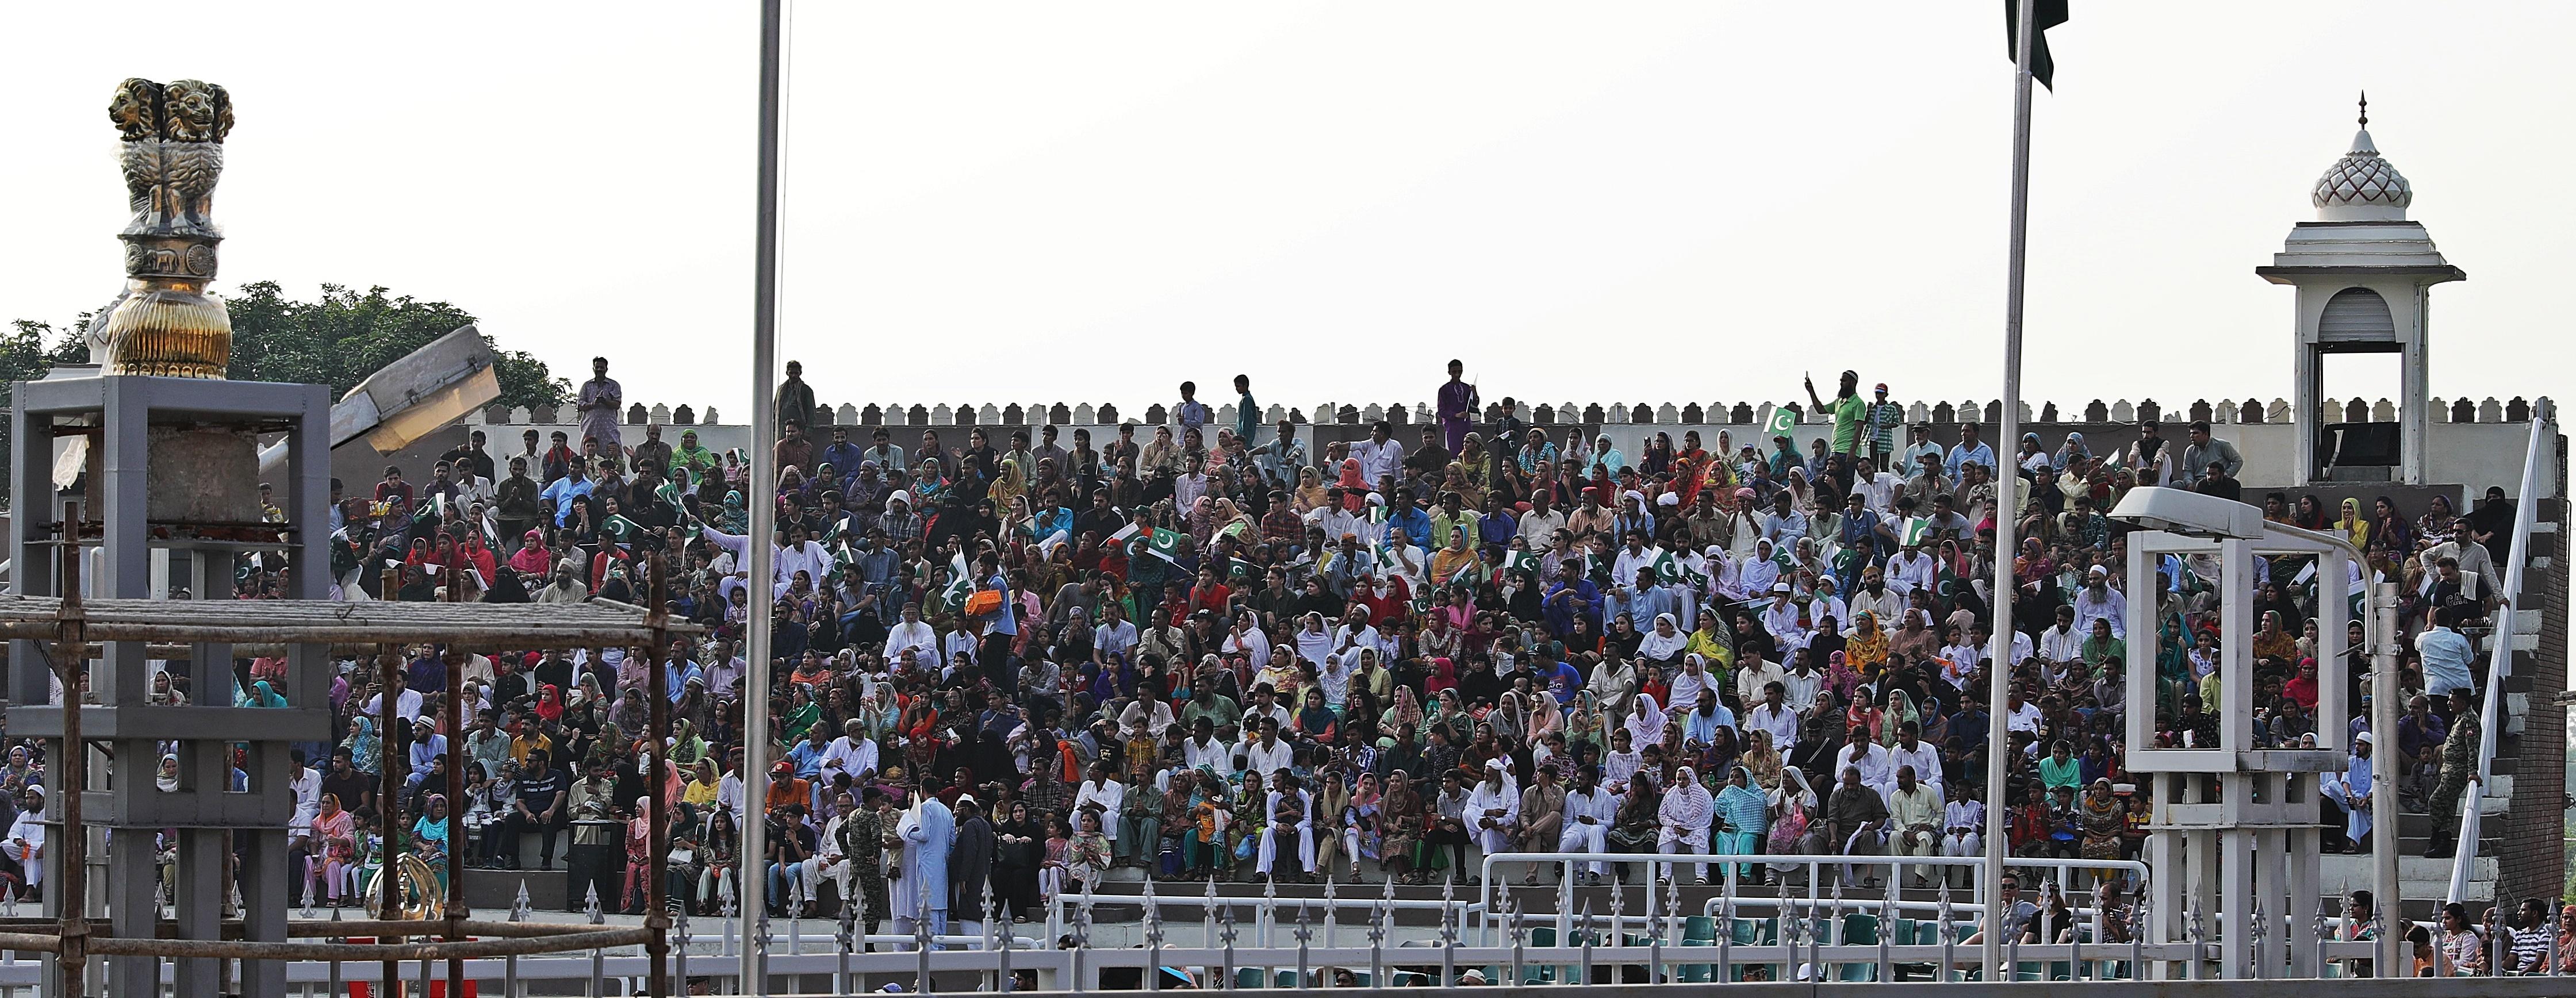 Pakistan's subdued crowd